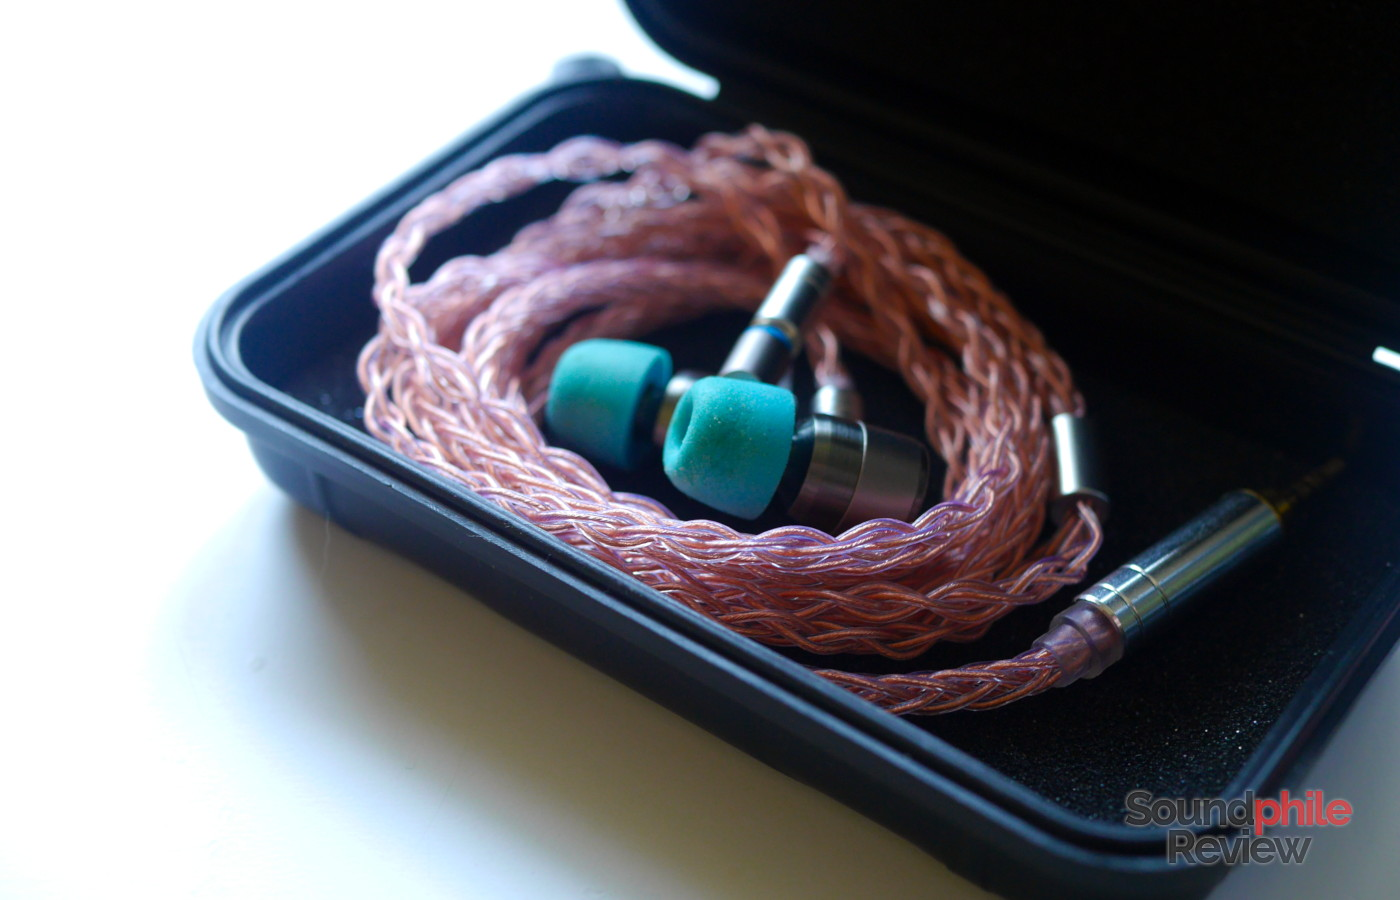 Kinboofi 8-core SPC cable review